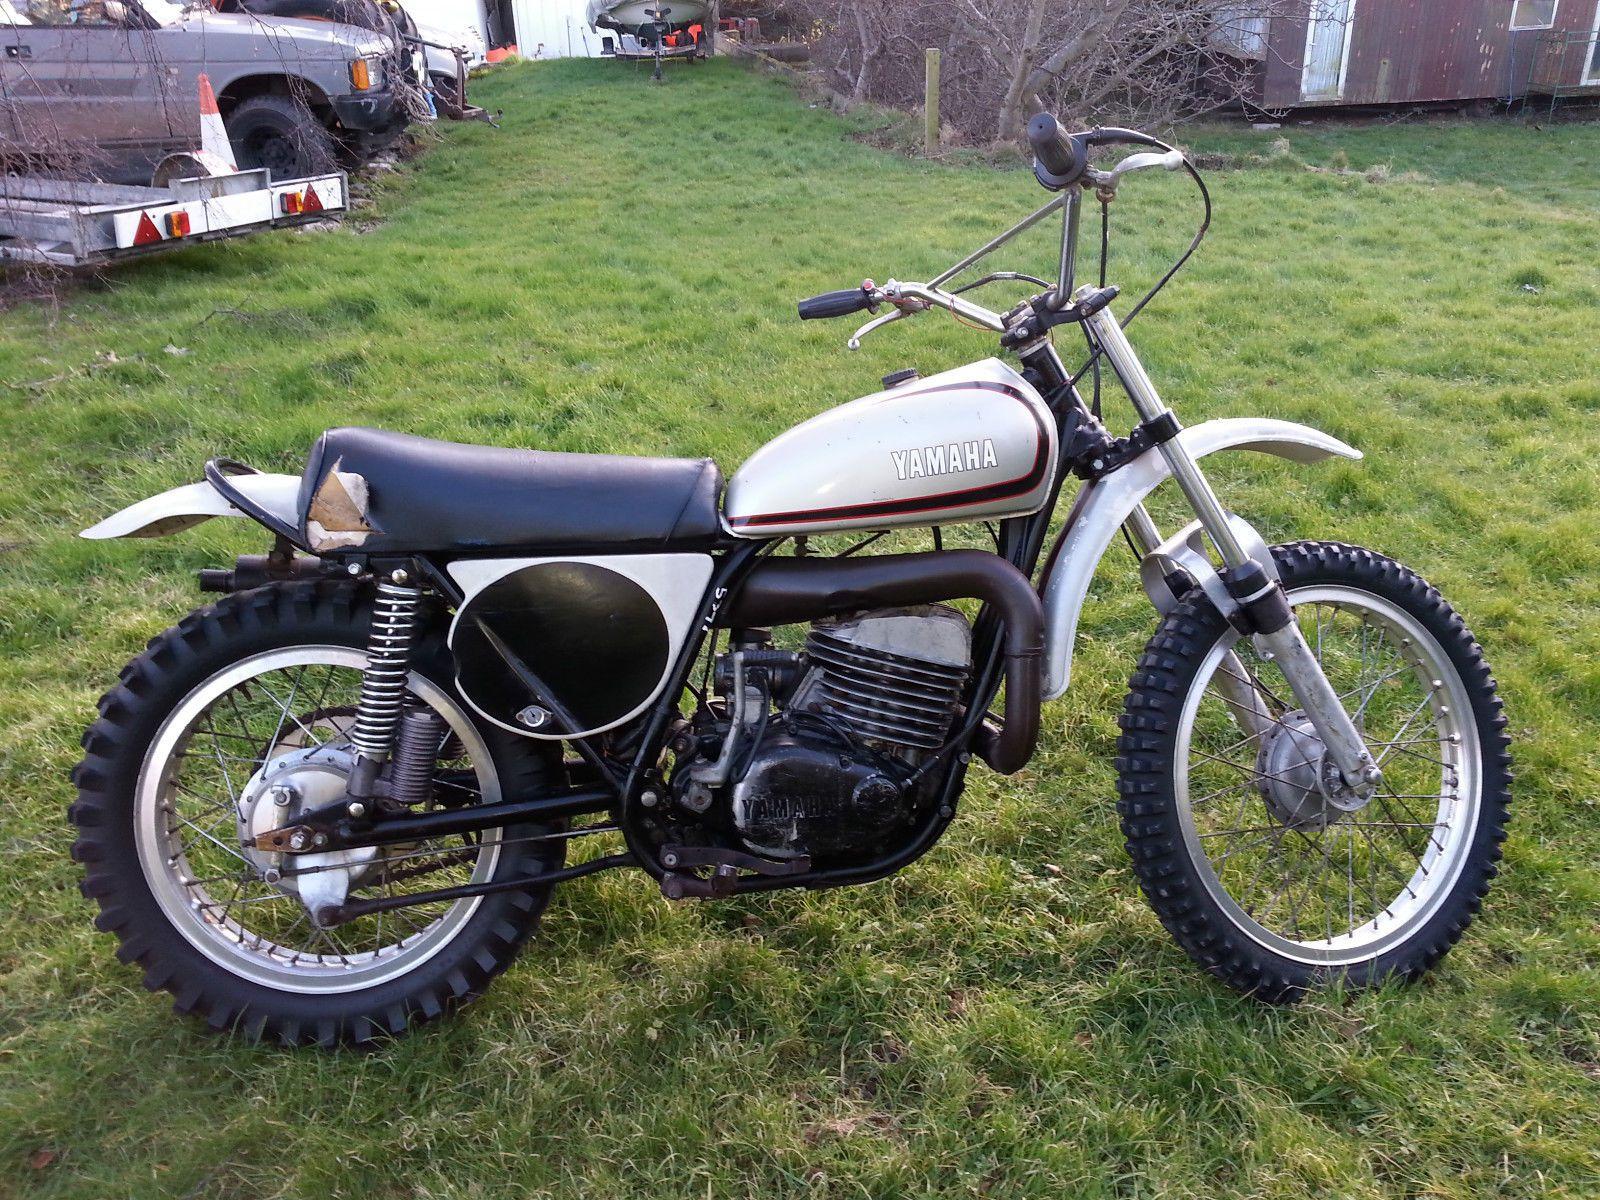 1973 Yamaha Sc500 Vintage Classic Motocross Twin Shock Motorcycle Rare Machine Motorcycle Motocross Vintage Bikes